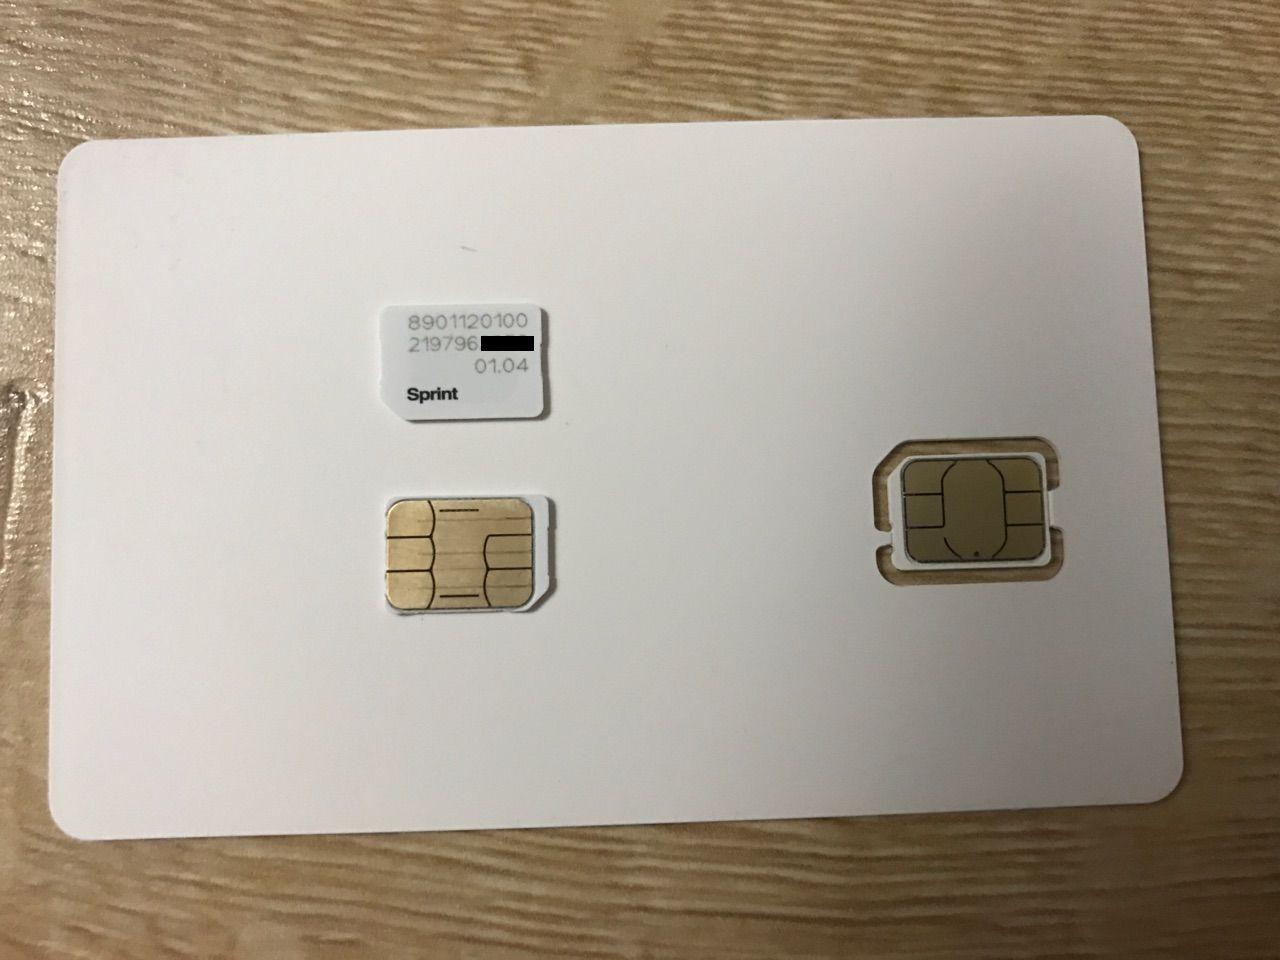 NEW SIMOLW506C for Sprint Boost Mobile Virgin Mobile Ring+ 3